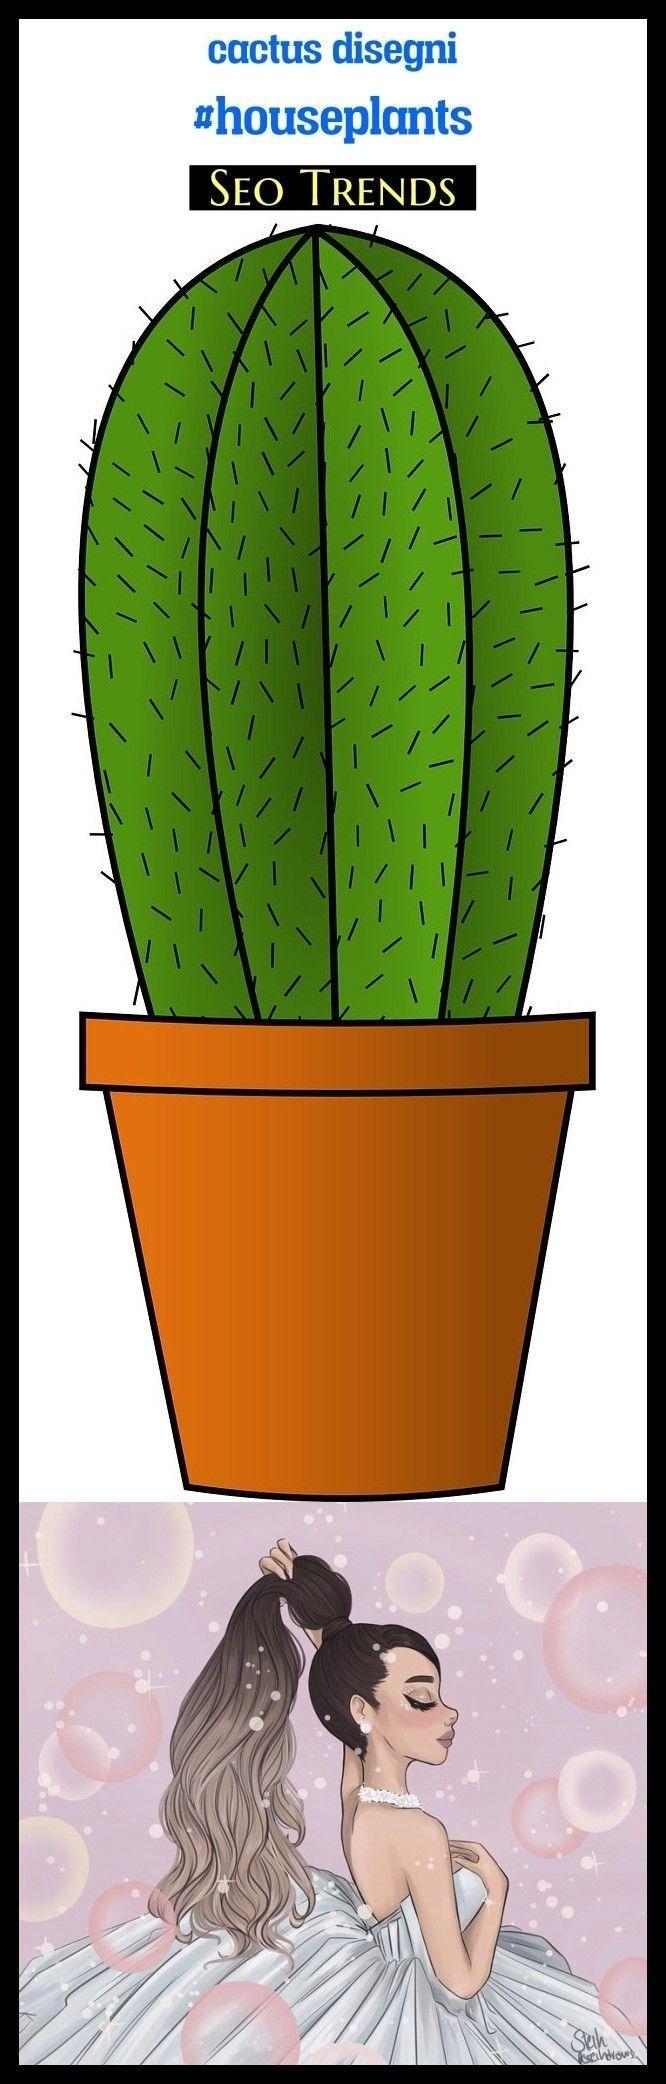 Photo of Cactus disegni #houseplants #seotips #seo #gardens. art artichoke, artichoke dibujo, c …